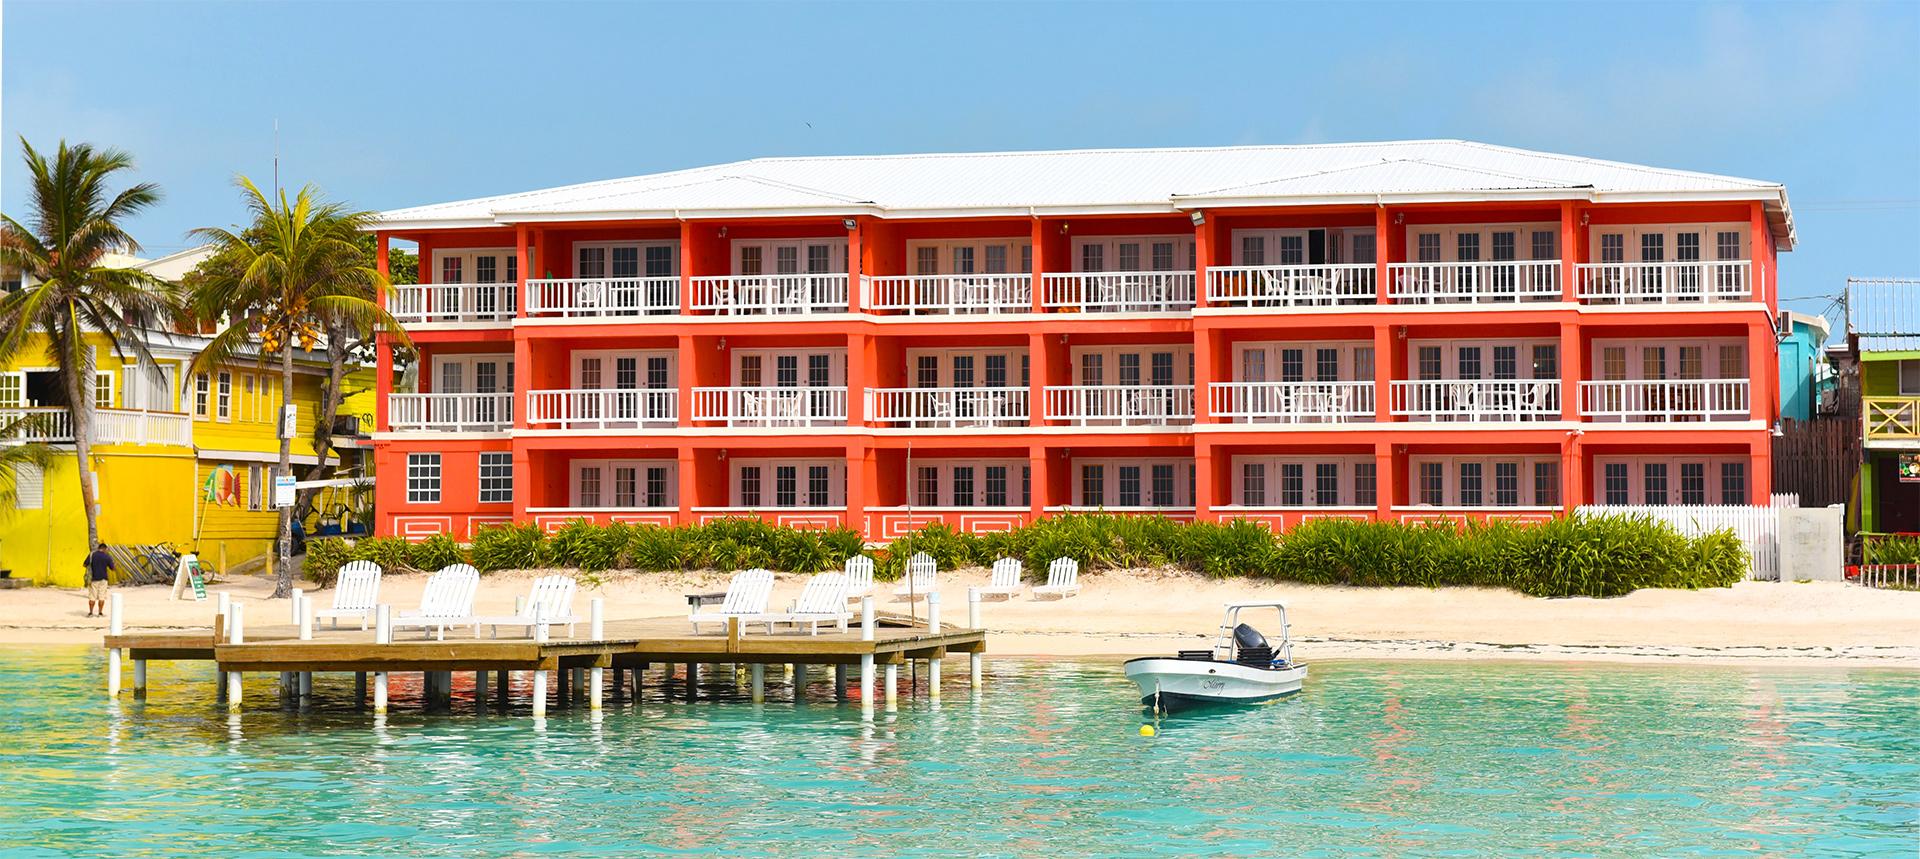 Hotel Beach - Winter Special - Mayan Princess Hotel, Belize